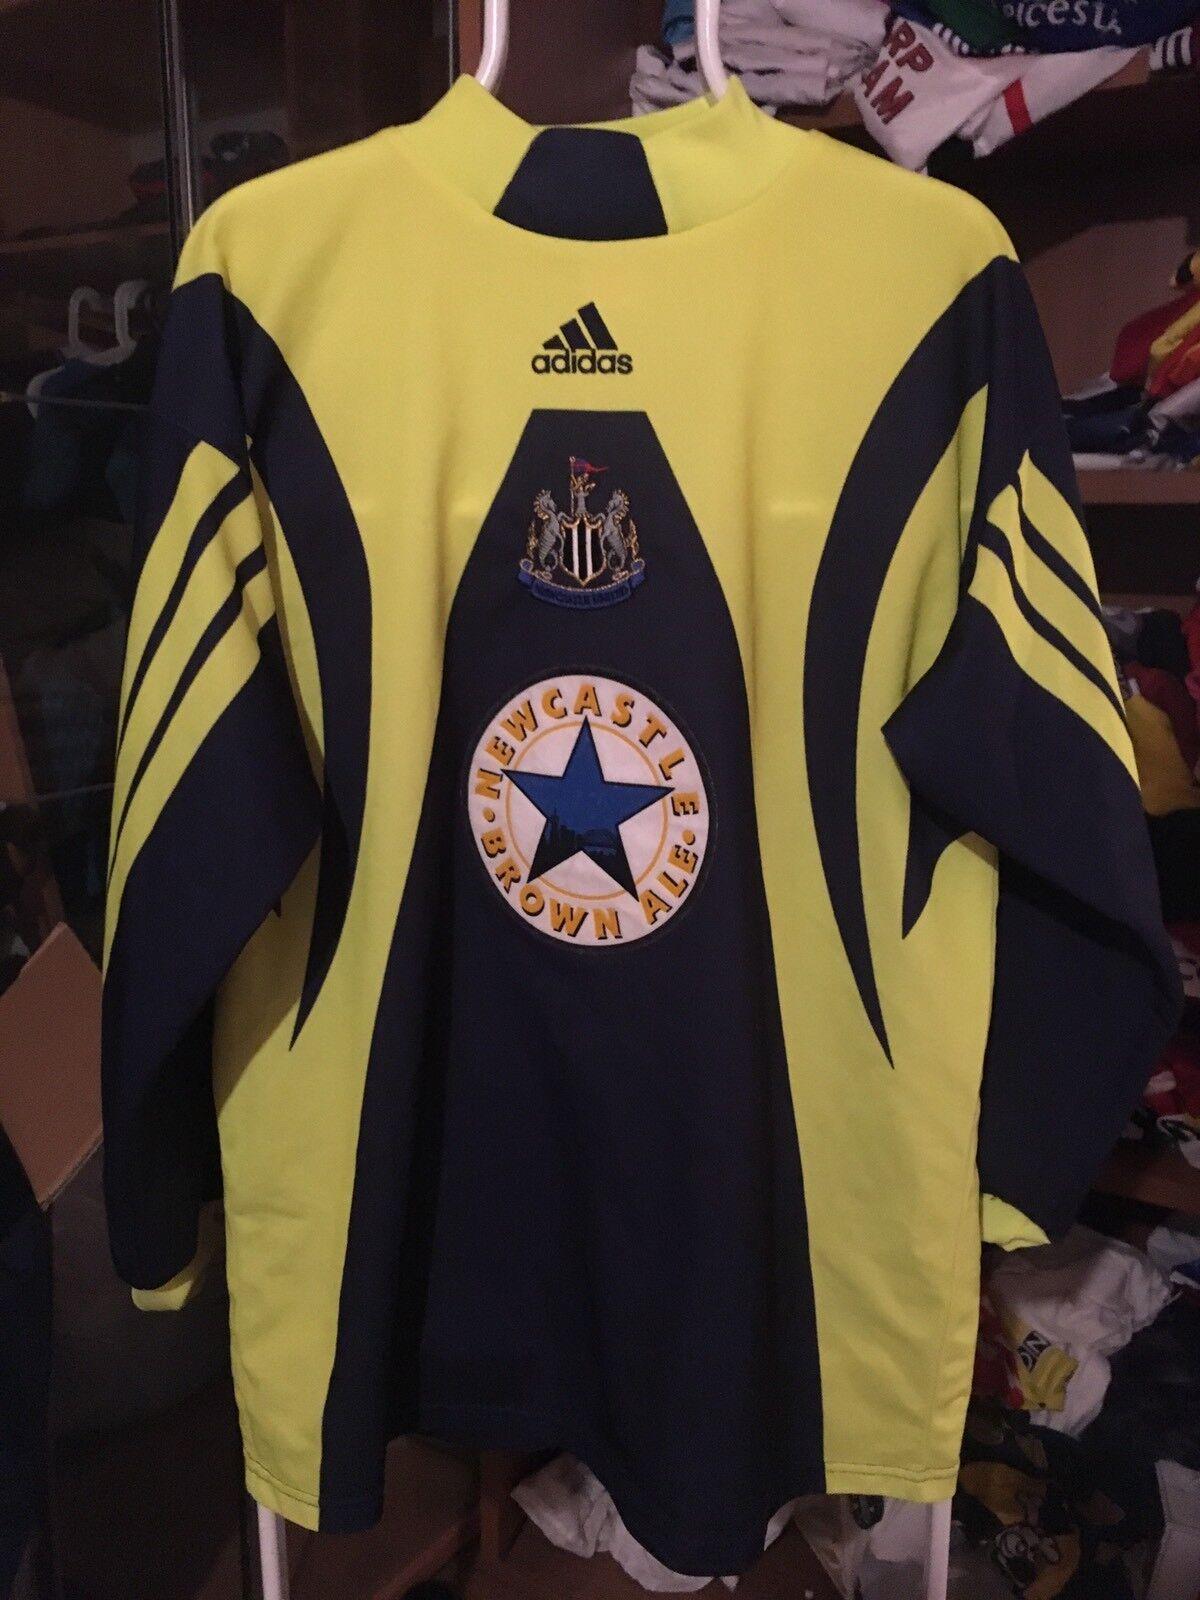 Camiseta Futbol Portero nuovocastle Given 9899 Vintage Irlea